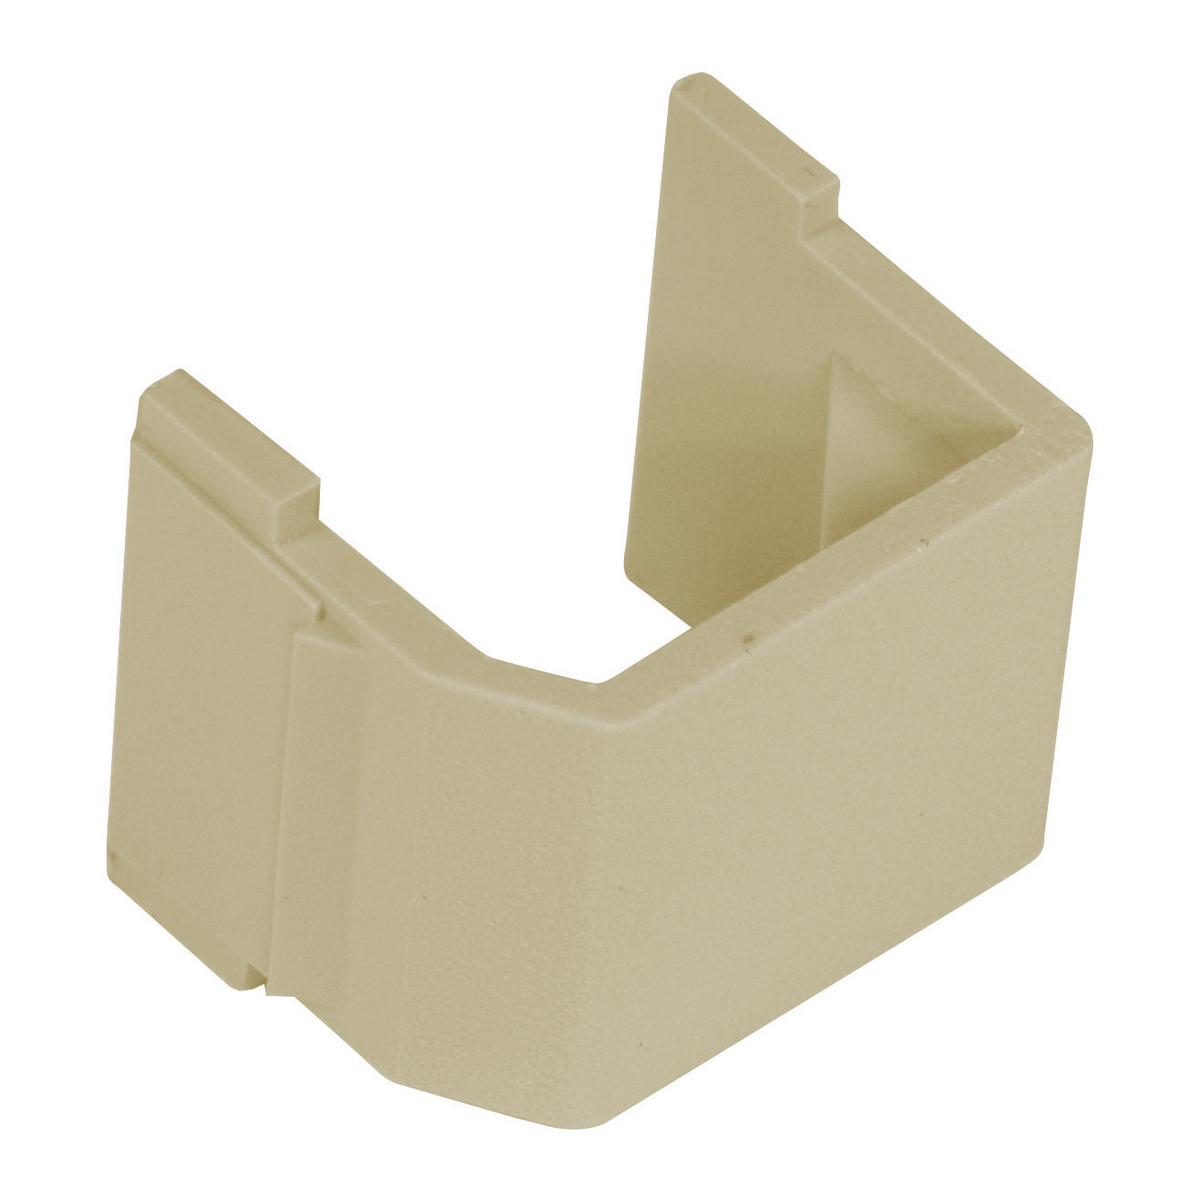 HUBPR SFBE10 SNAP-FIT, BLANK, EI, 10PK Blank insert electric ivory, 10/PK